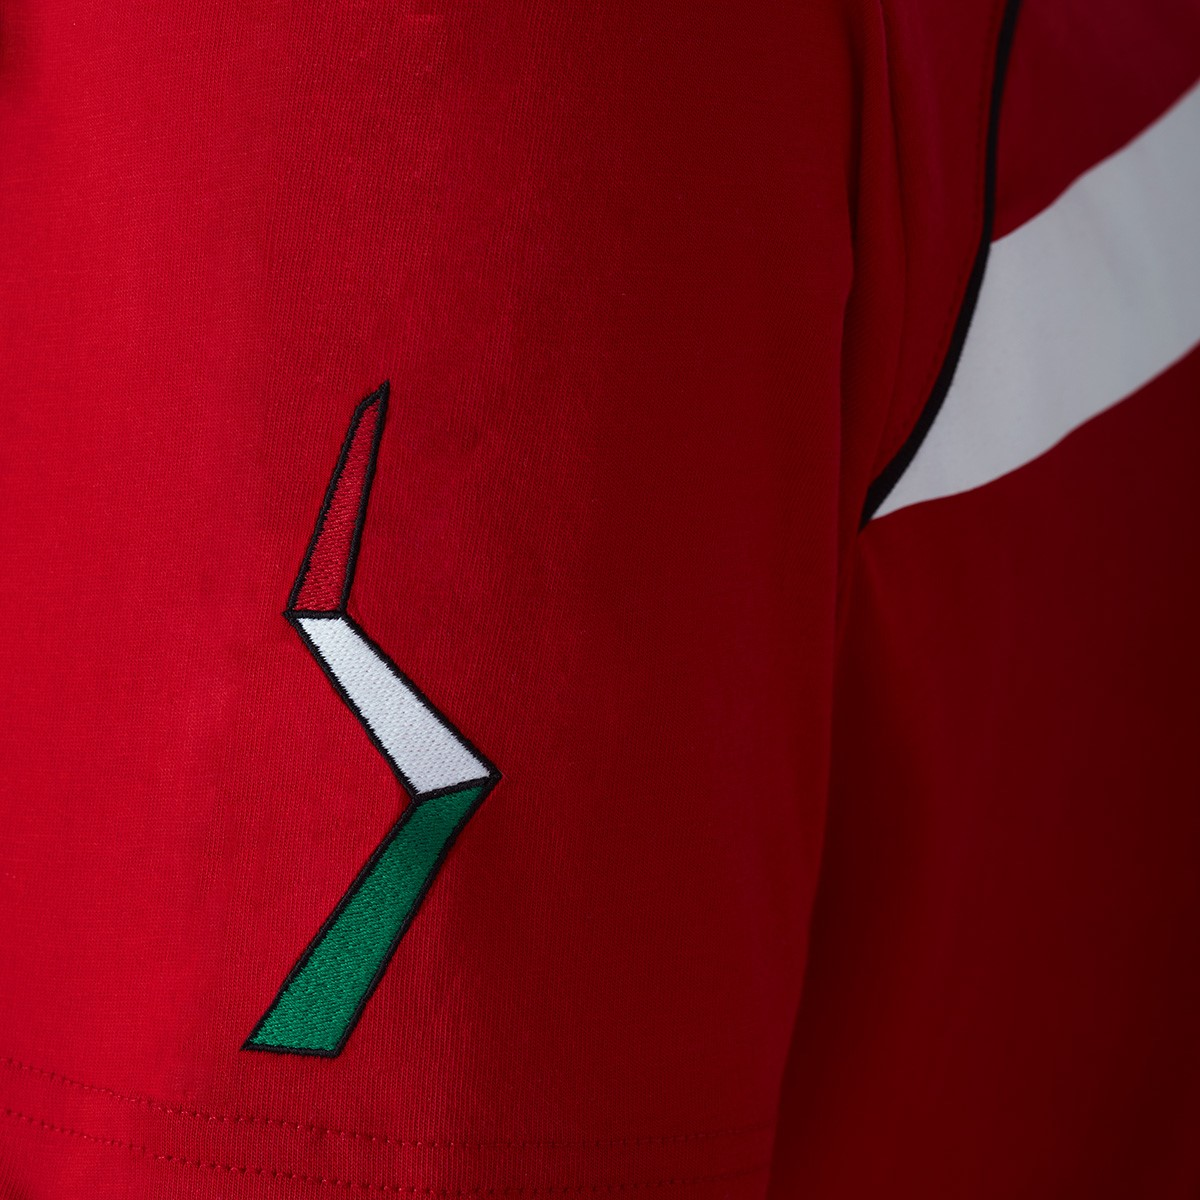 【DUCATI performance】Ducati Corse Speed 紅色 T恤 - 「Webike-摩托百貨」